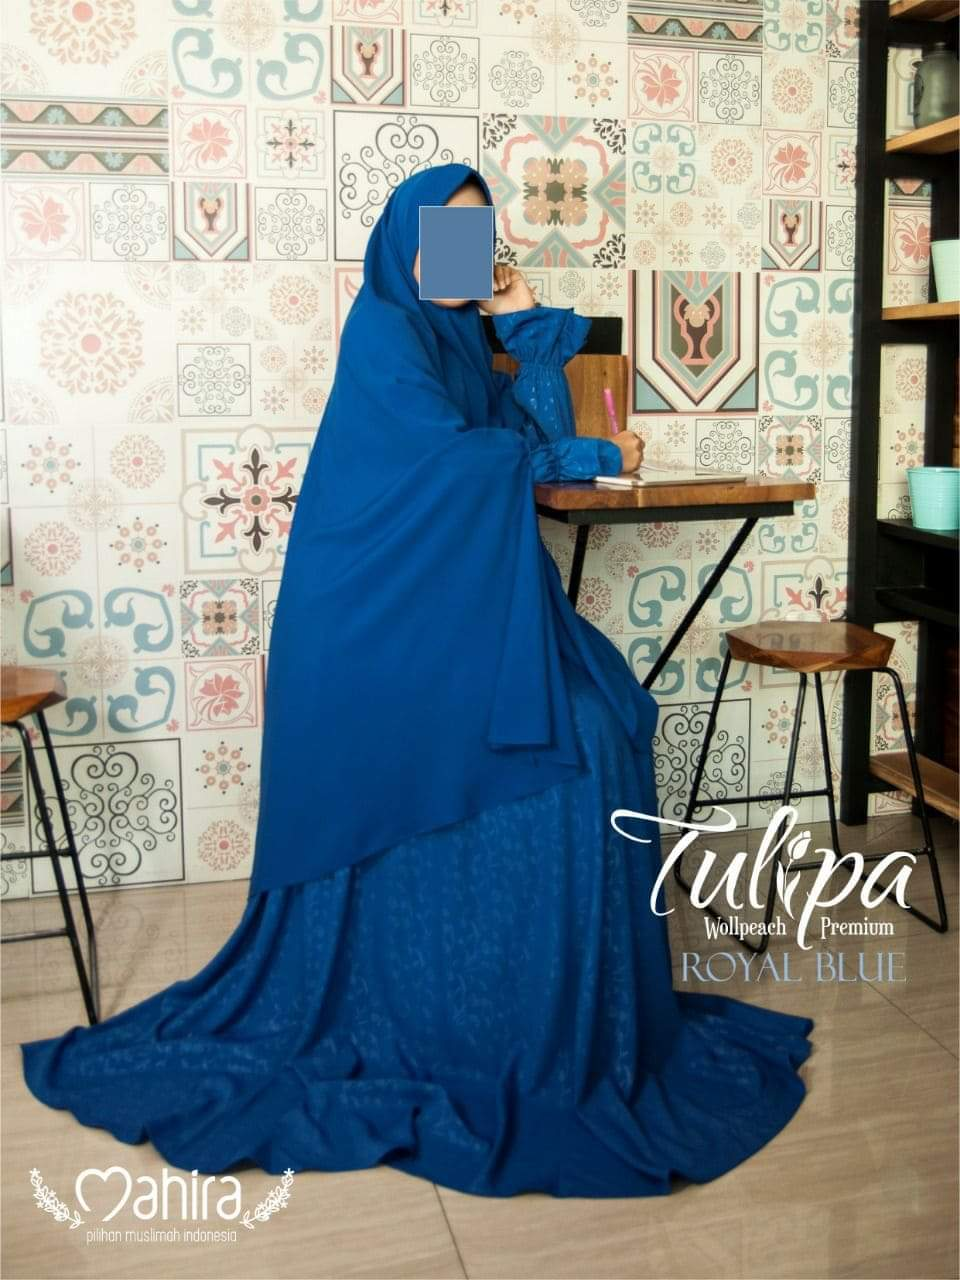 Mahira Tulipa Wollpeach Premium Royal Blue